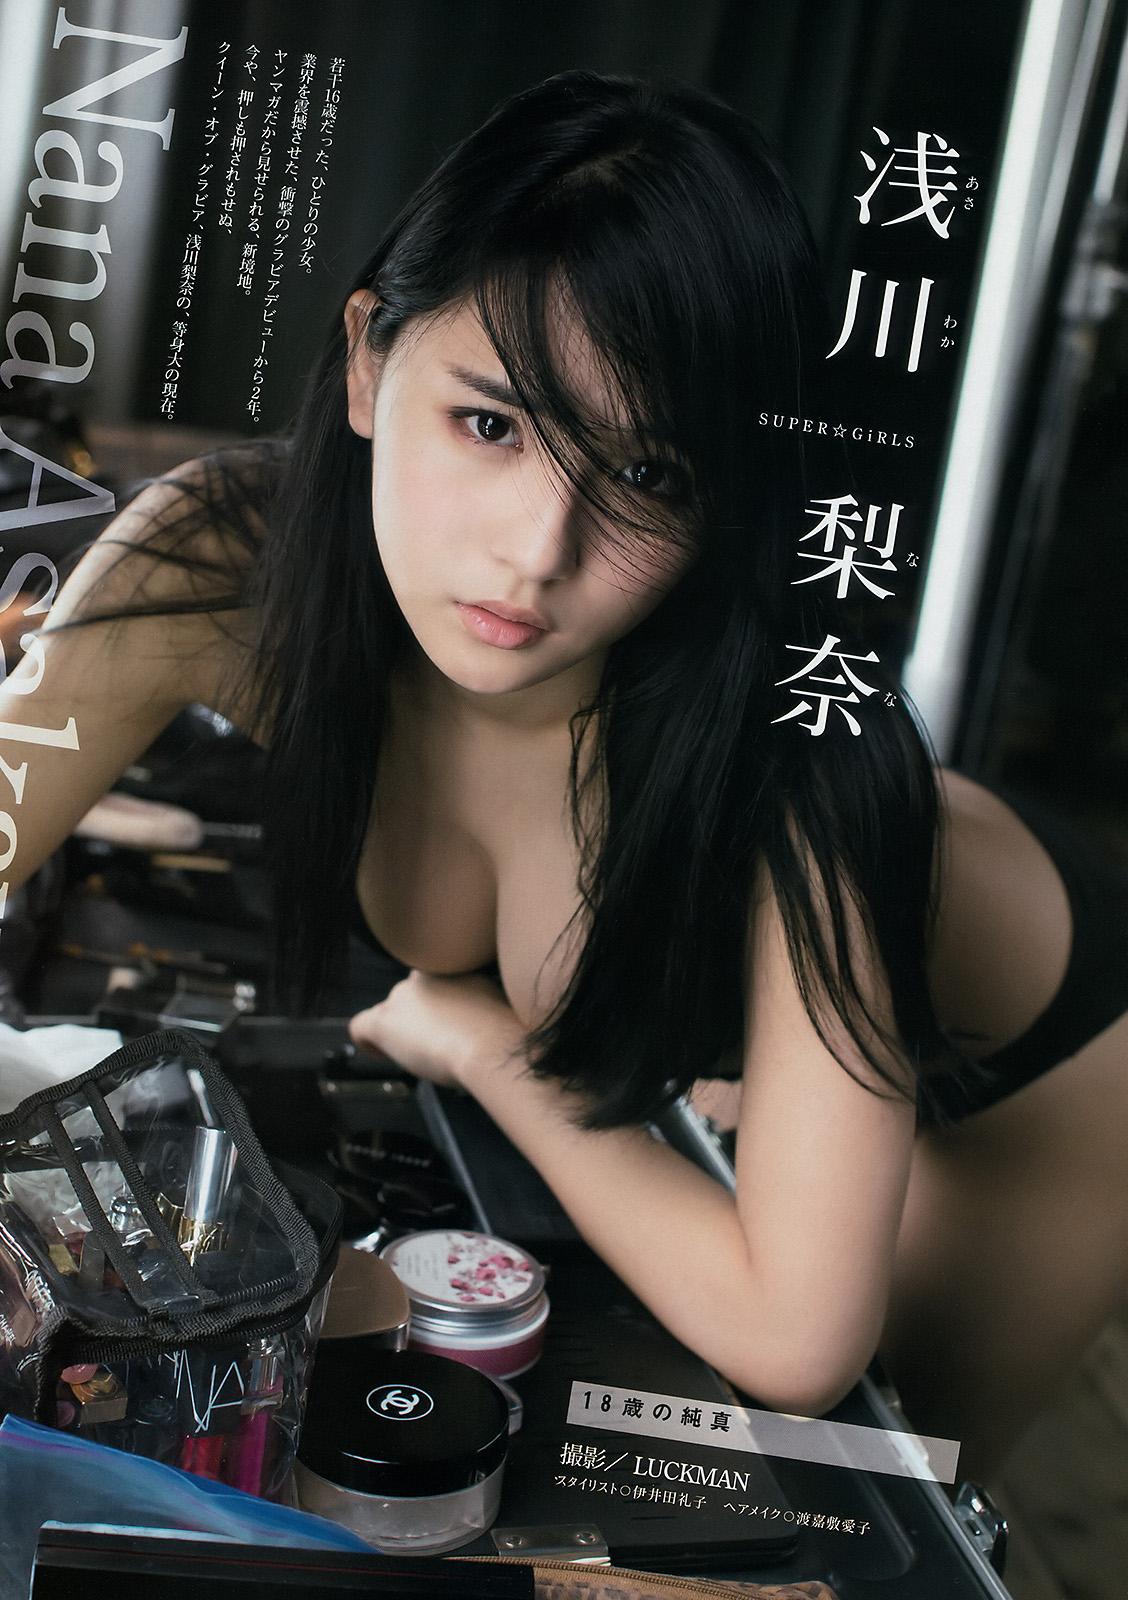 Asakawa Nana 浅川梨奈 SUPER☆GiRLS, Young Magazine 2017.06.05 No.25 (週刊ヤングマガジン 2017年25号)